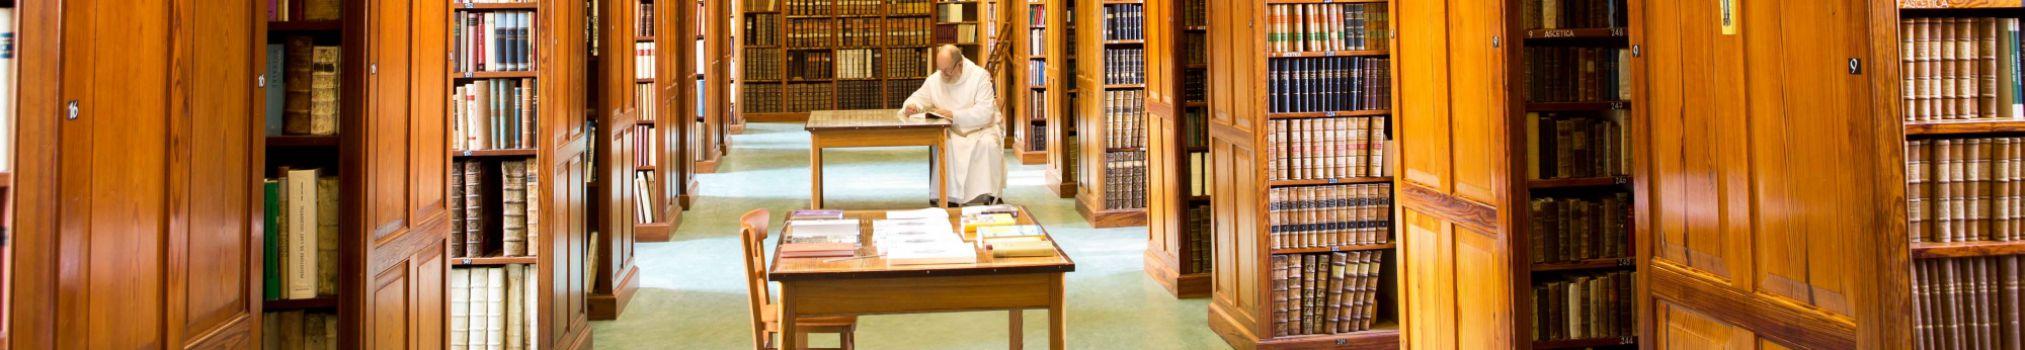 Lectio Divina o Lettura Santa